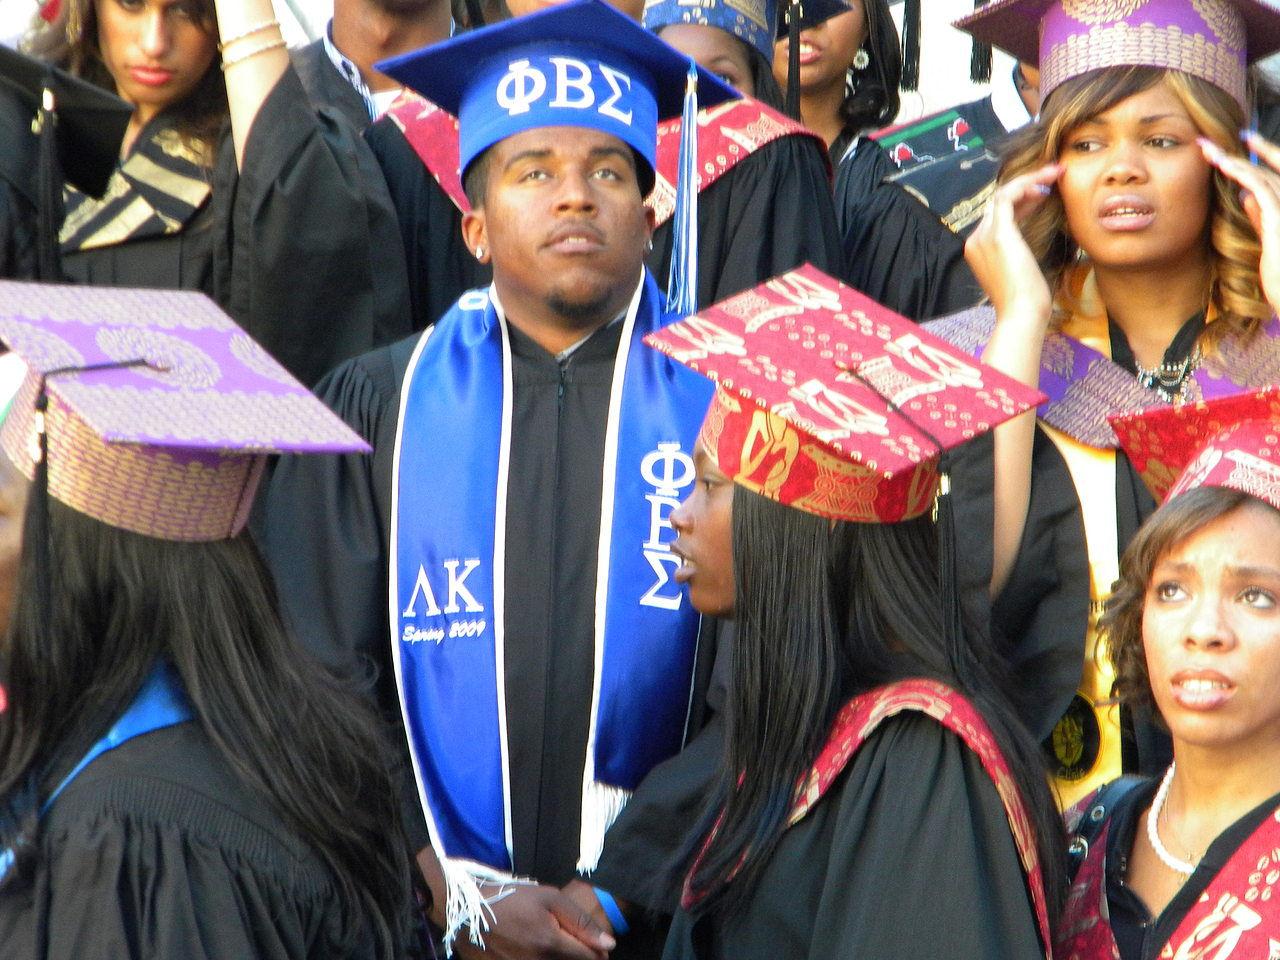 An Ethnic Celebration Graduation Wear